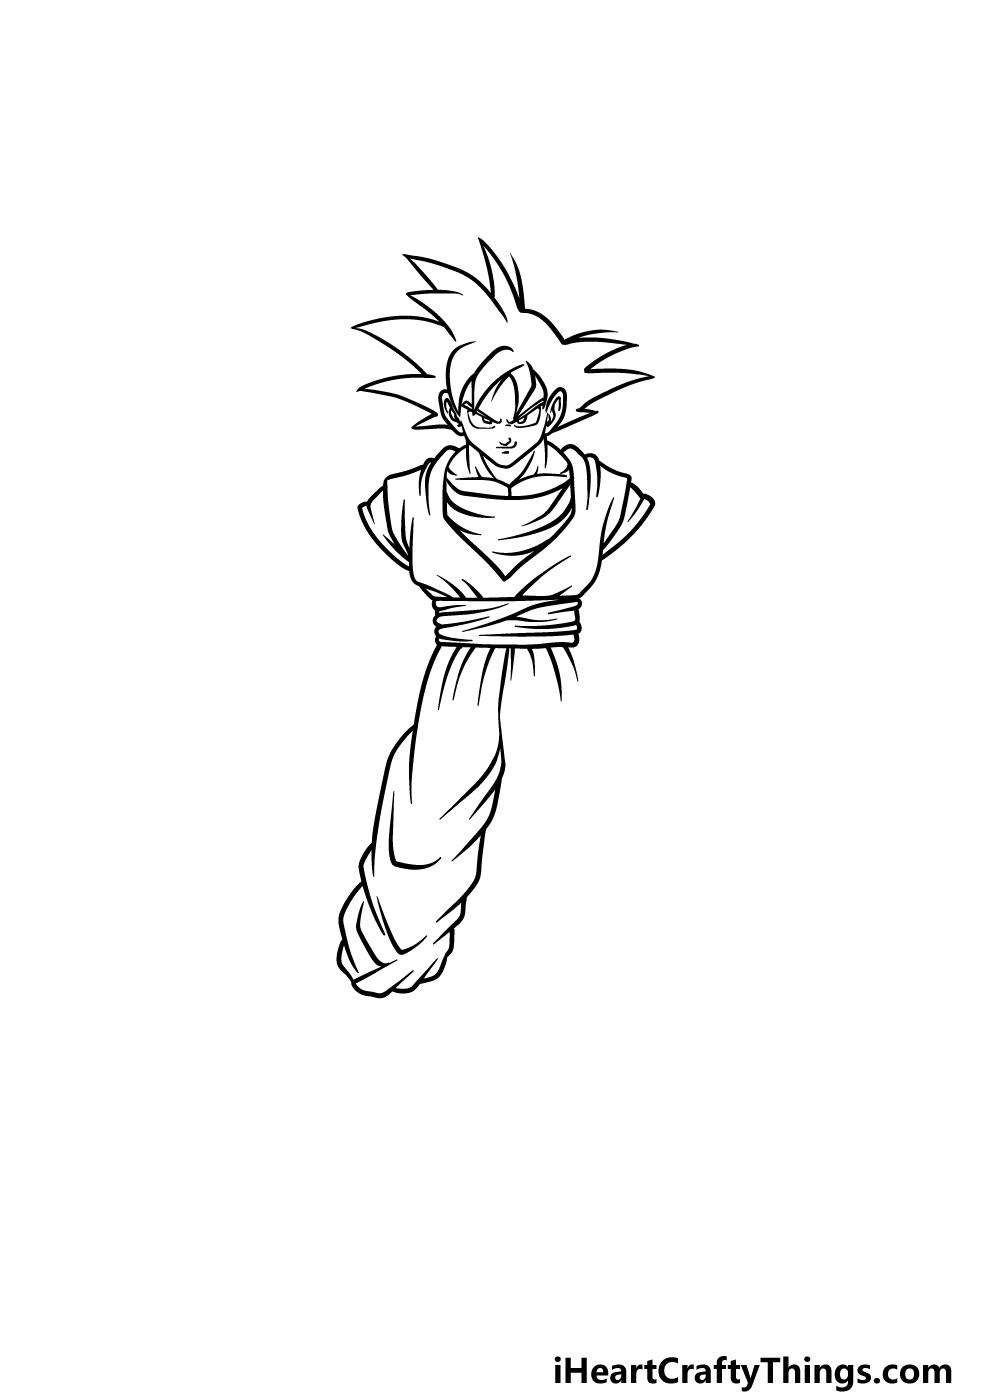 drawing Goku step 3